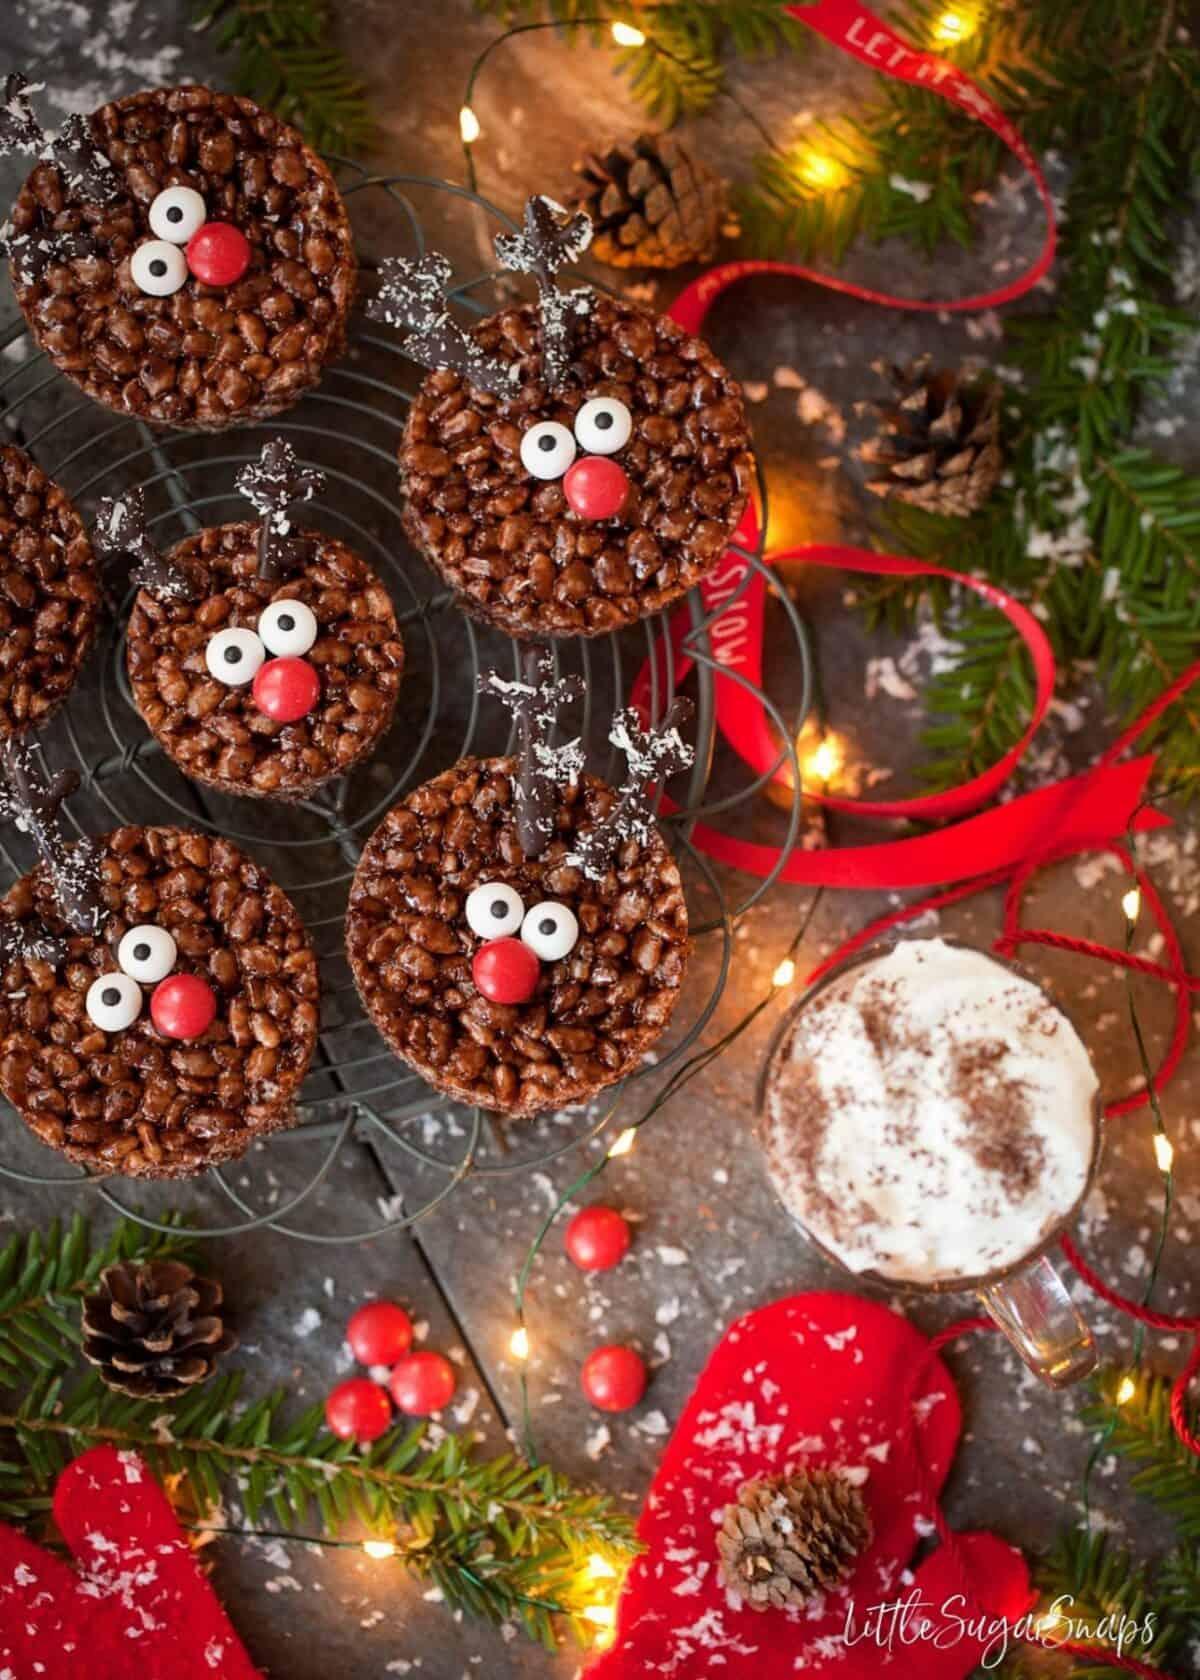 Round chocolate treats decorated like reindeer.